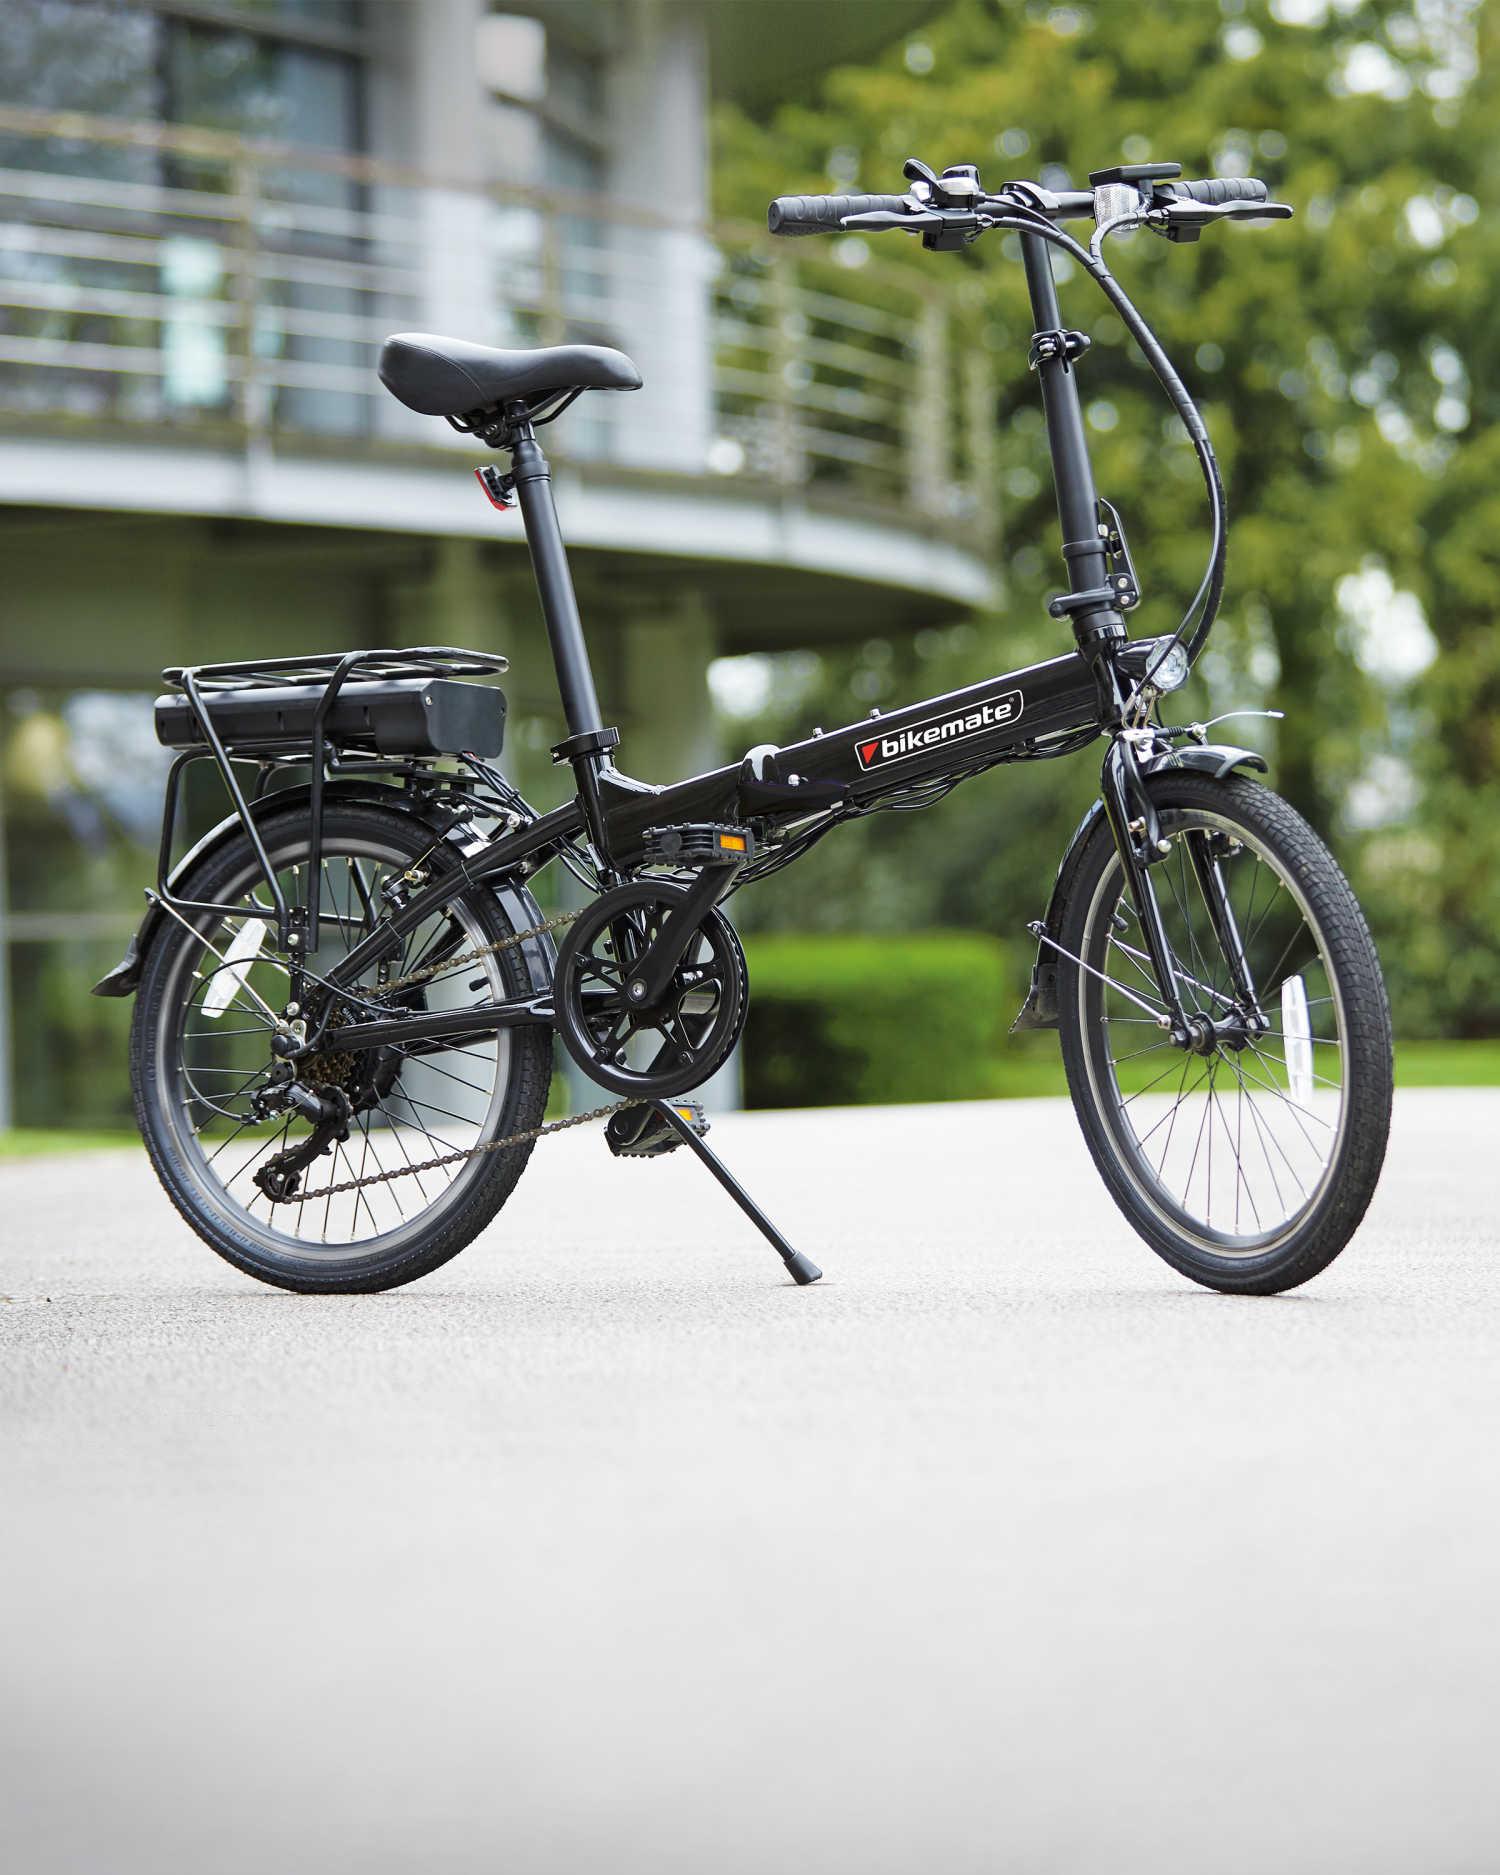 aldi folding ebike on sale now 499 pedelecs electric bike community. Black Bedroom Furniture Sets. Home Design Ideas